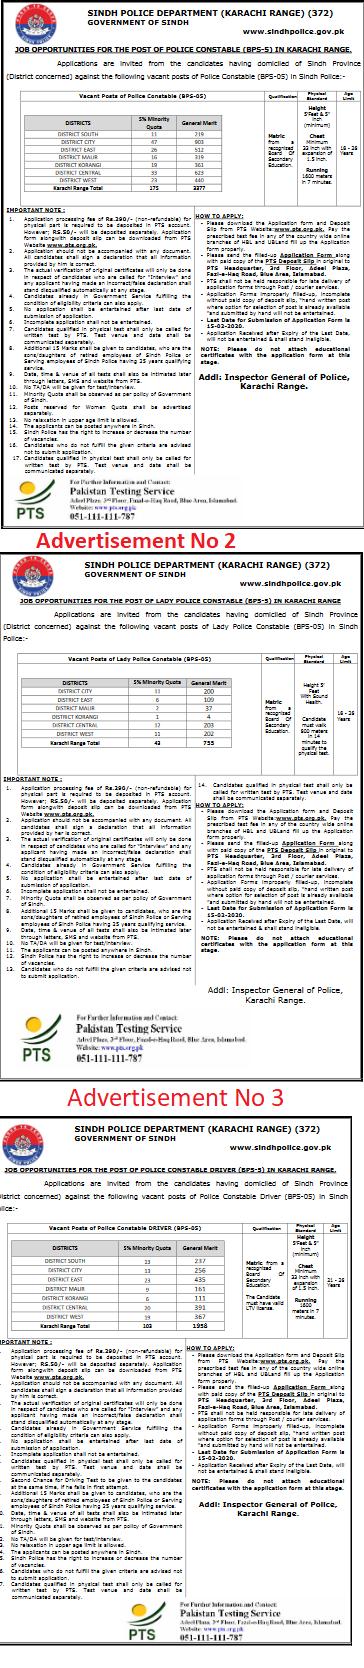 Sindh Police Karachi Range Jobs 2020 PTS Application Form Roll No Slip Download online